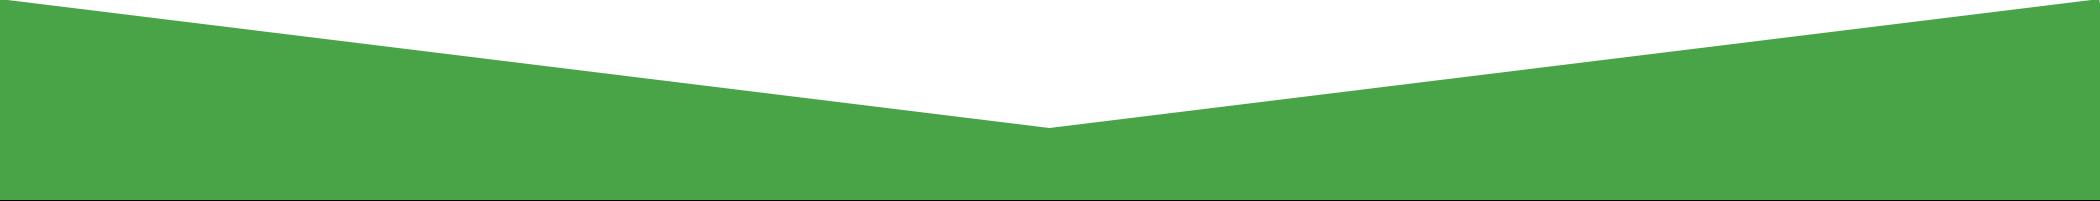 Chevron background